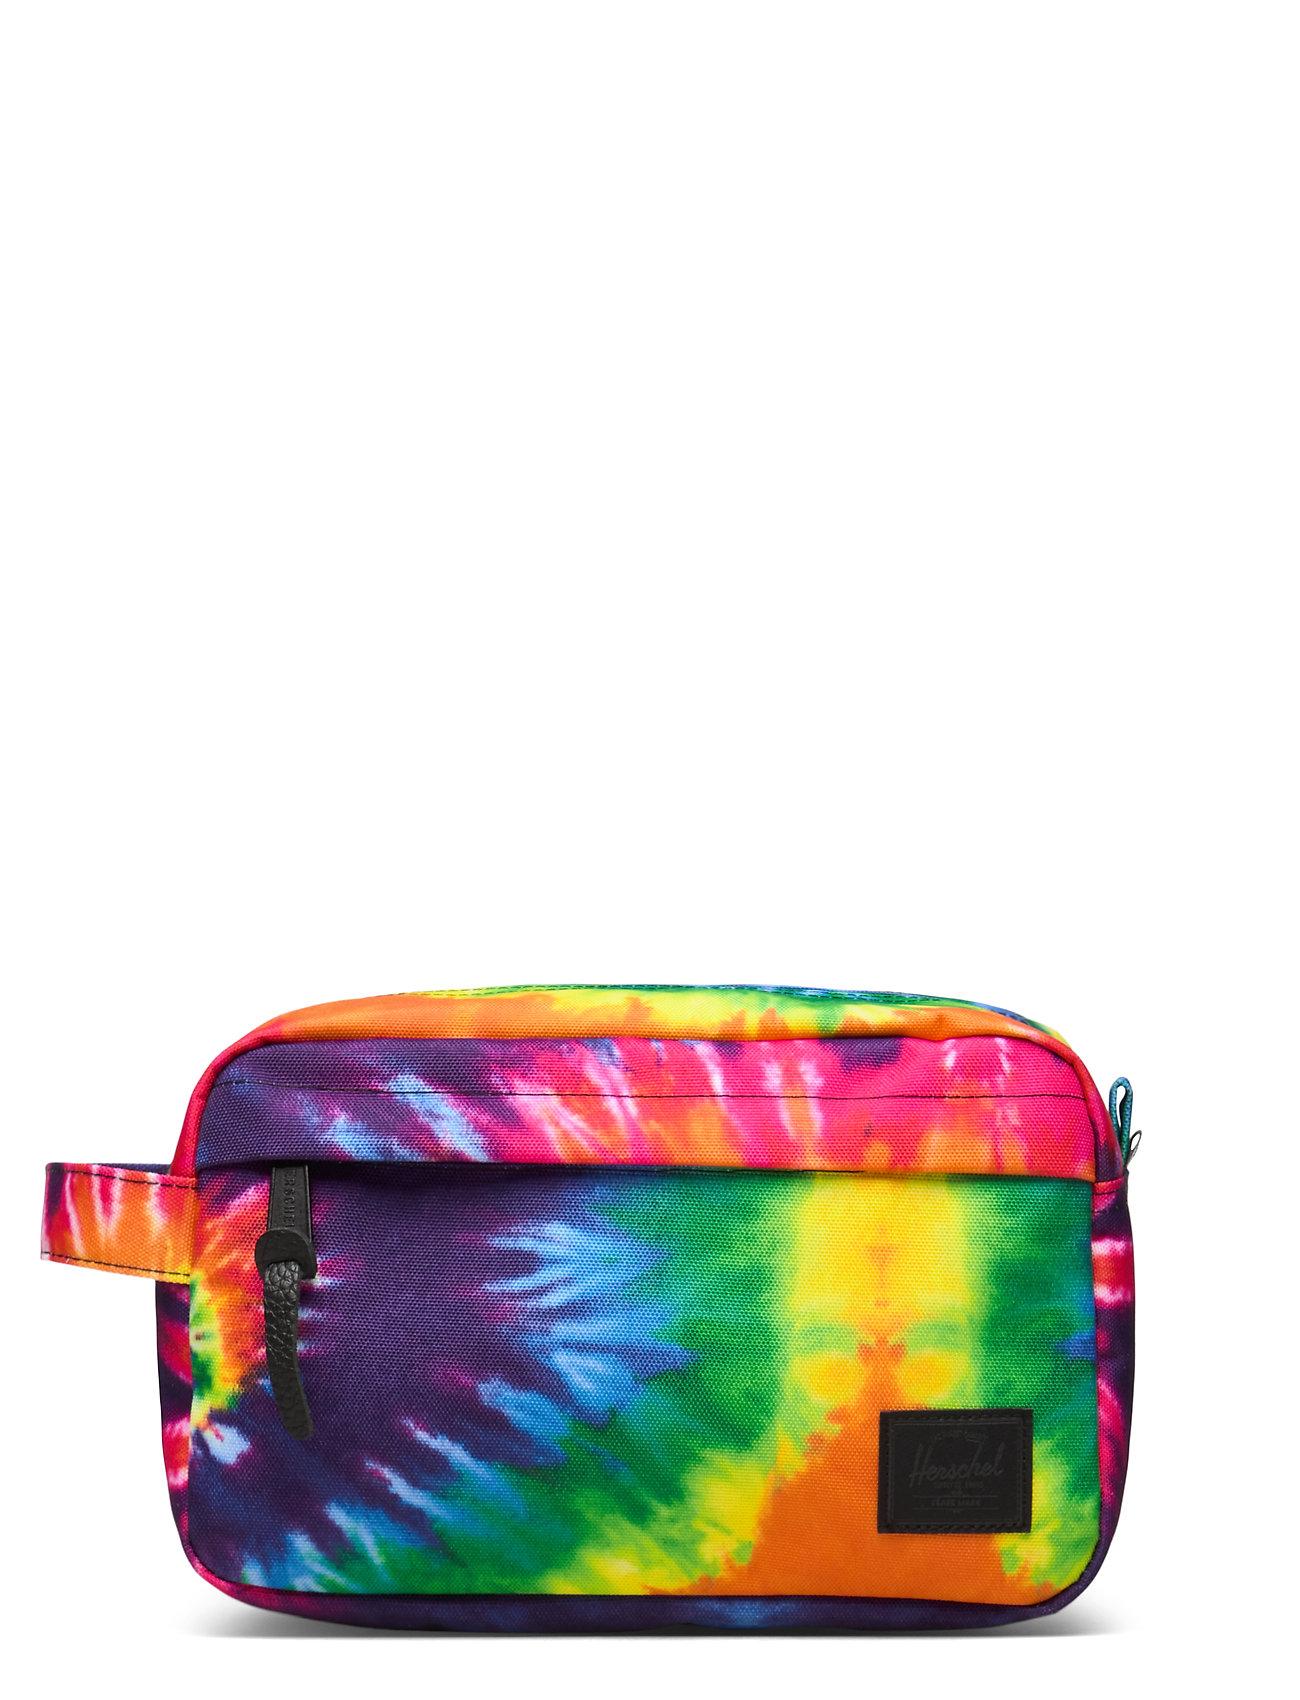 Herschel Chapter-Rainbow Tie Dye - RAINBOW TIE DYE